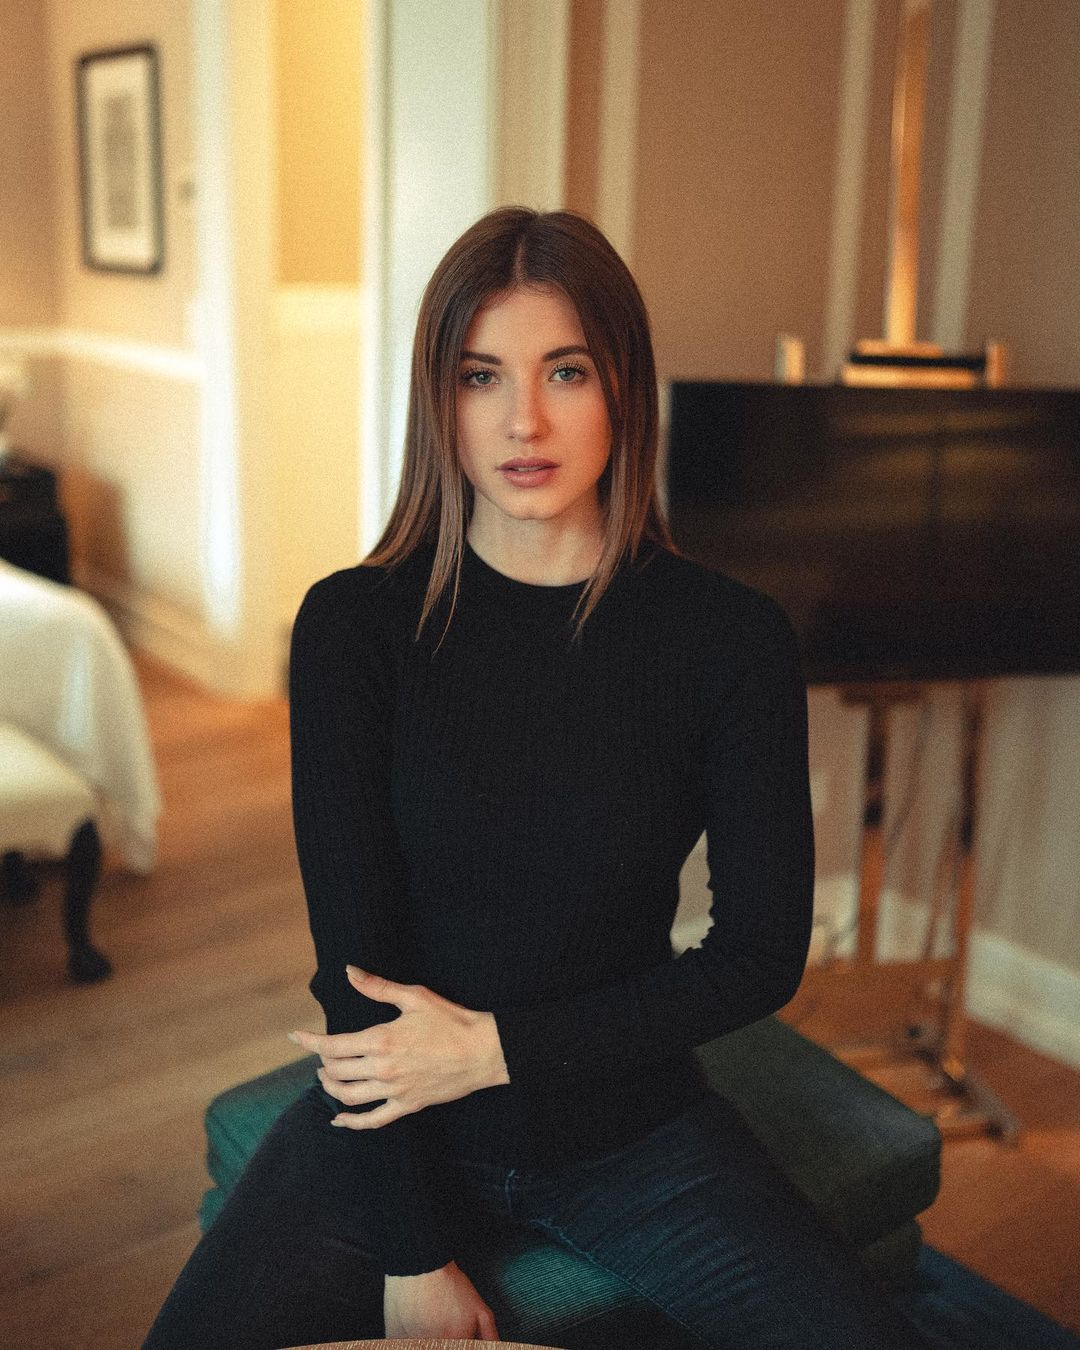 Julia-Nikola-Gauly-Wallpapers-Insta-Fit-Bio-2